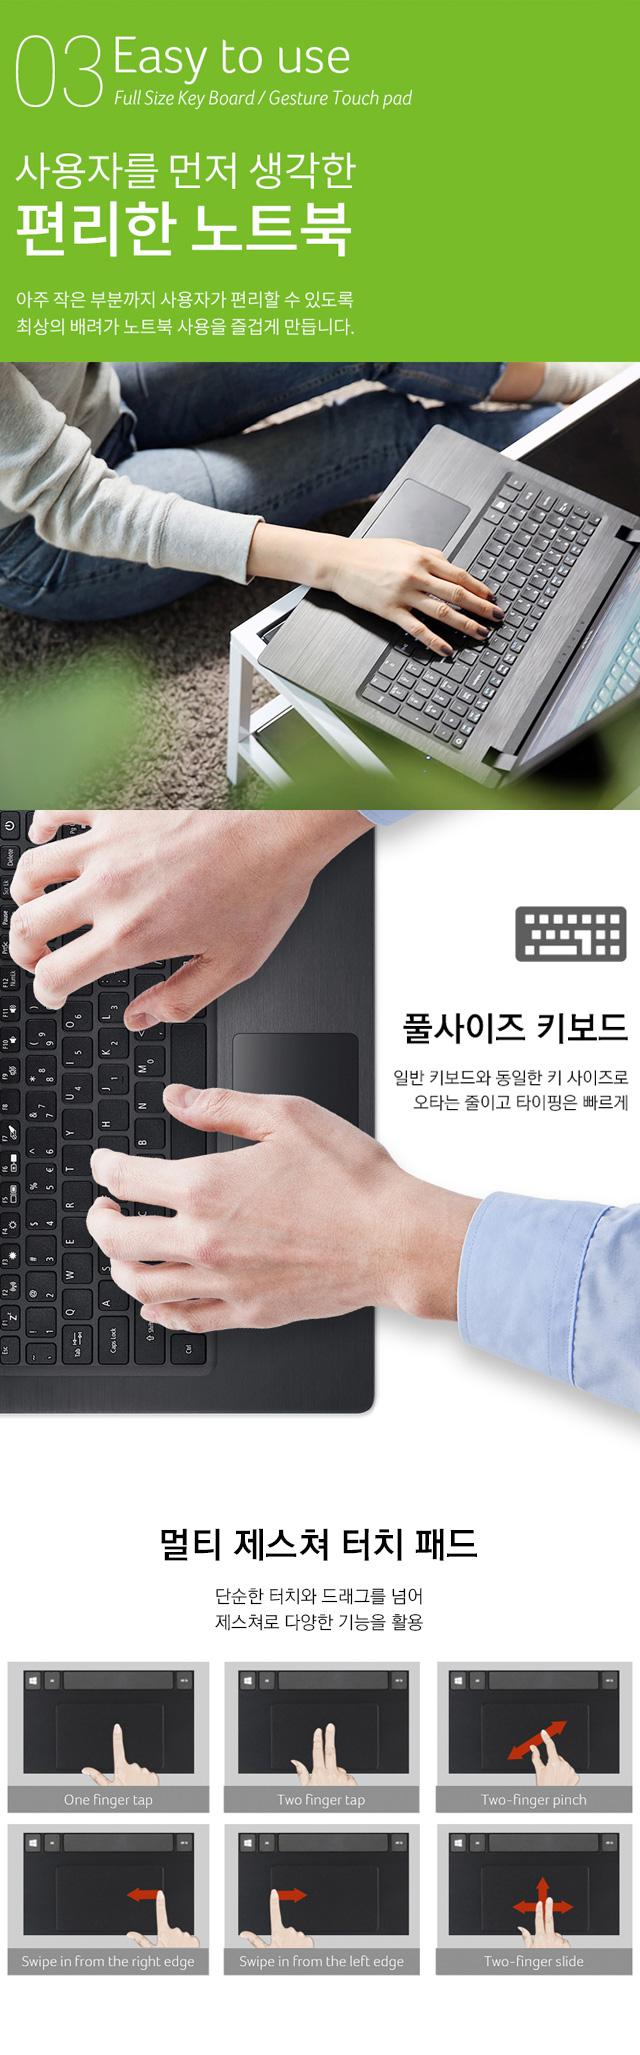 03 Easy to use Full Size Key Board/Gesture Touch pad 사용자를 먼저 생각한 편리한 노트북 아주 작은 부분까지 사용자가 편리할 수 있도록 최상의 배려가 노트북 사용을 즐겁게 만듭니다. -풀사이즈 키보드 일반 키보드와 동일한 키 사이즈로 오타는 줄이고 타이핑은 빠르게 -멀티 제스쳐 터치 패드 단순한 터치와 드래그를 넘어 제스쳐로 다양한 기능을 활용